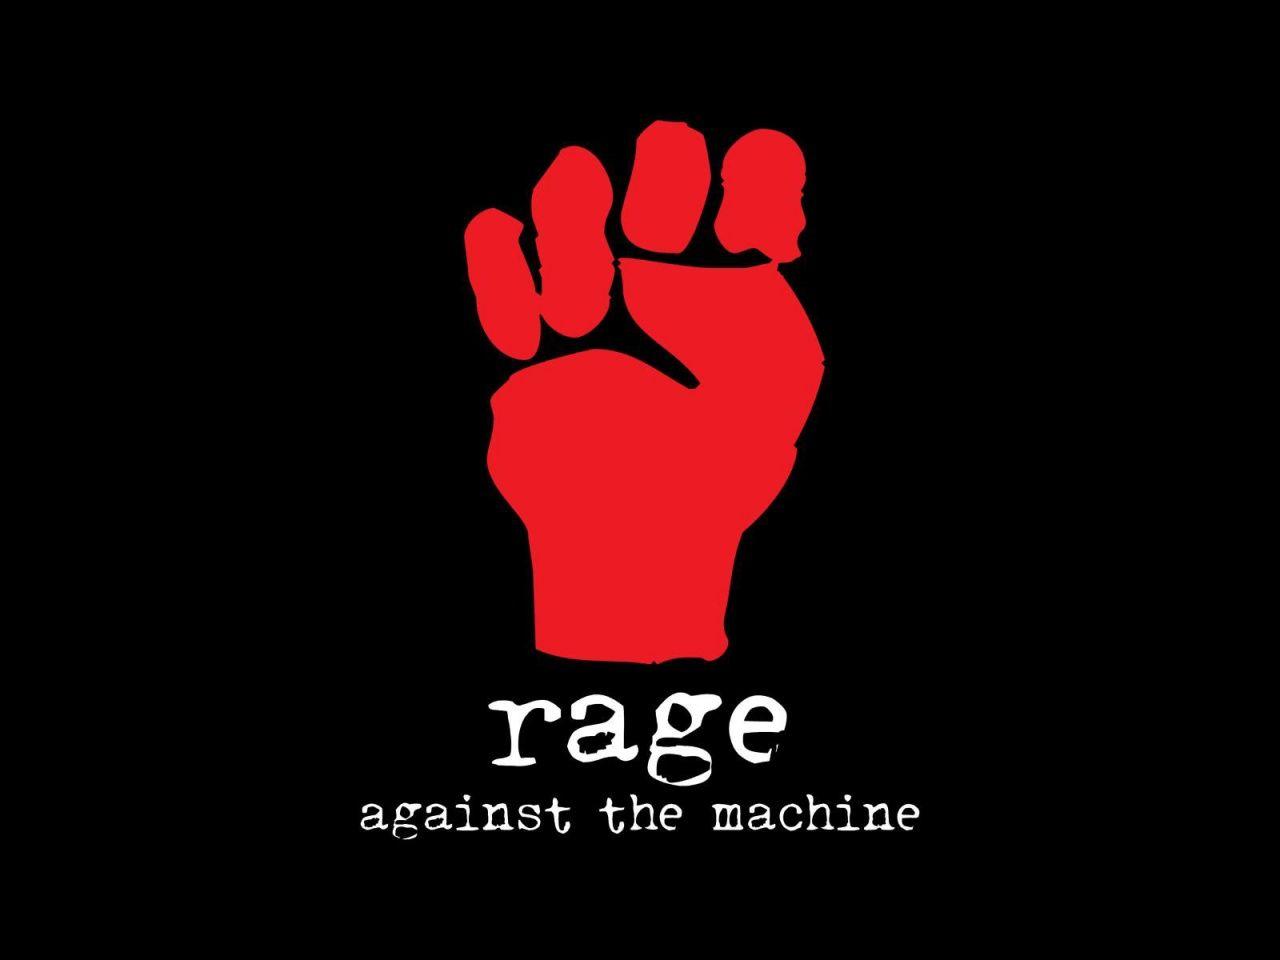 Logotipo de Rage Against the Machine.